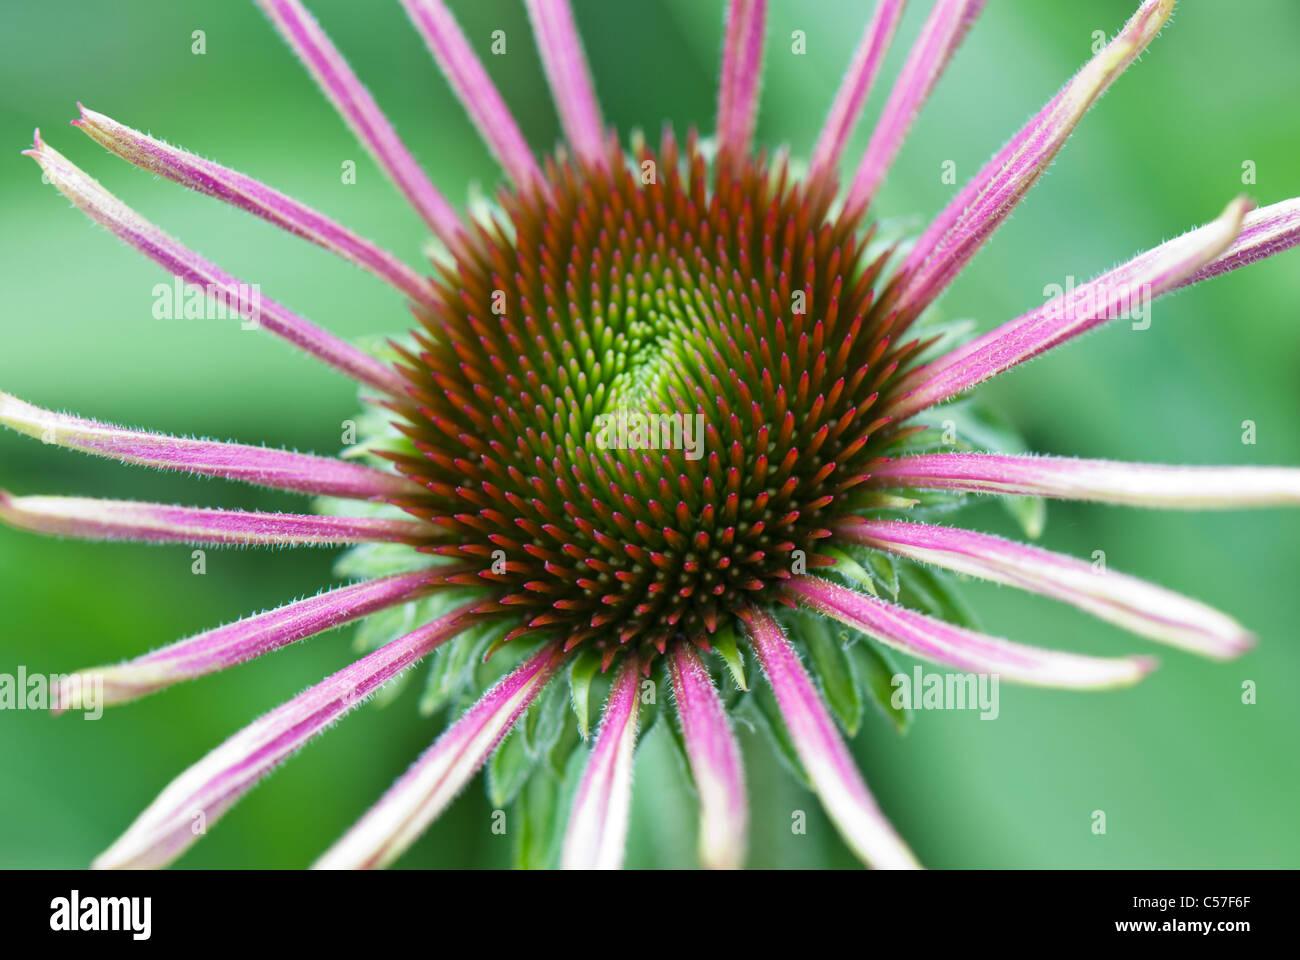 Echinacea purpurea also known as eastern purple coneflower or purple coneflower - Stock Image